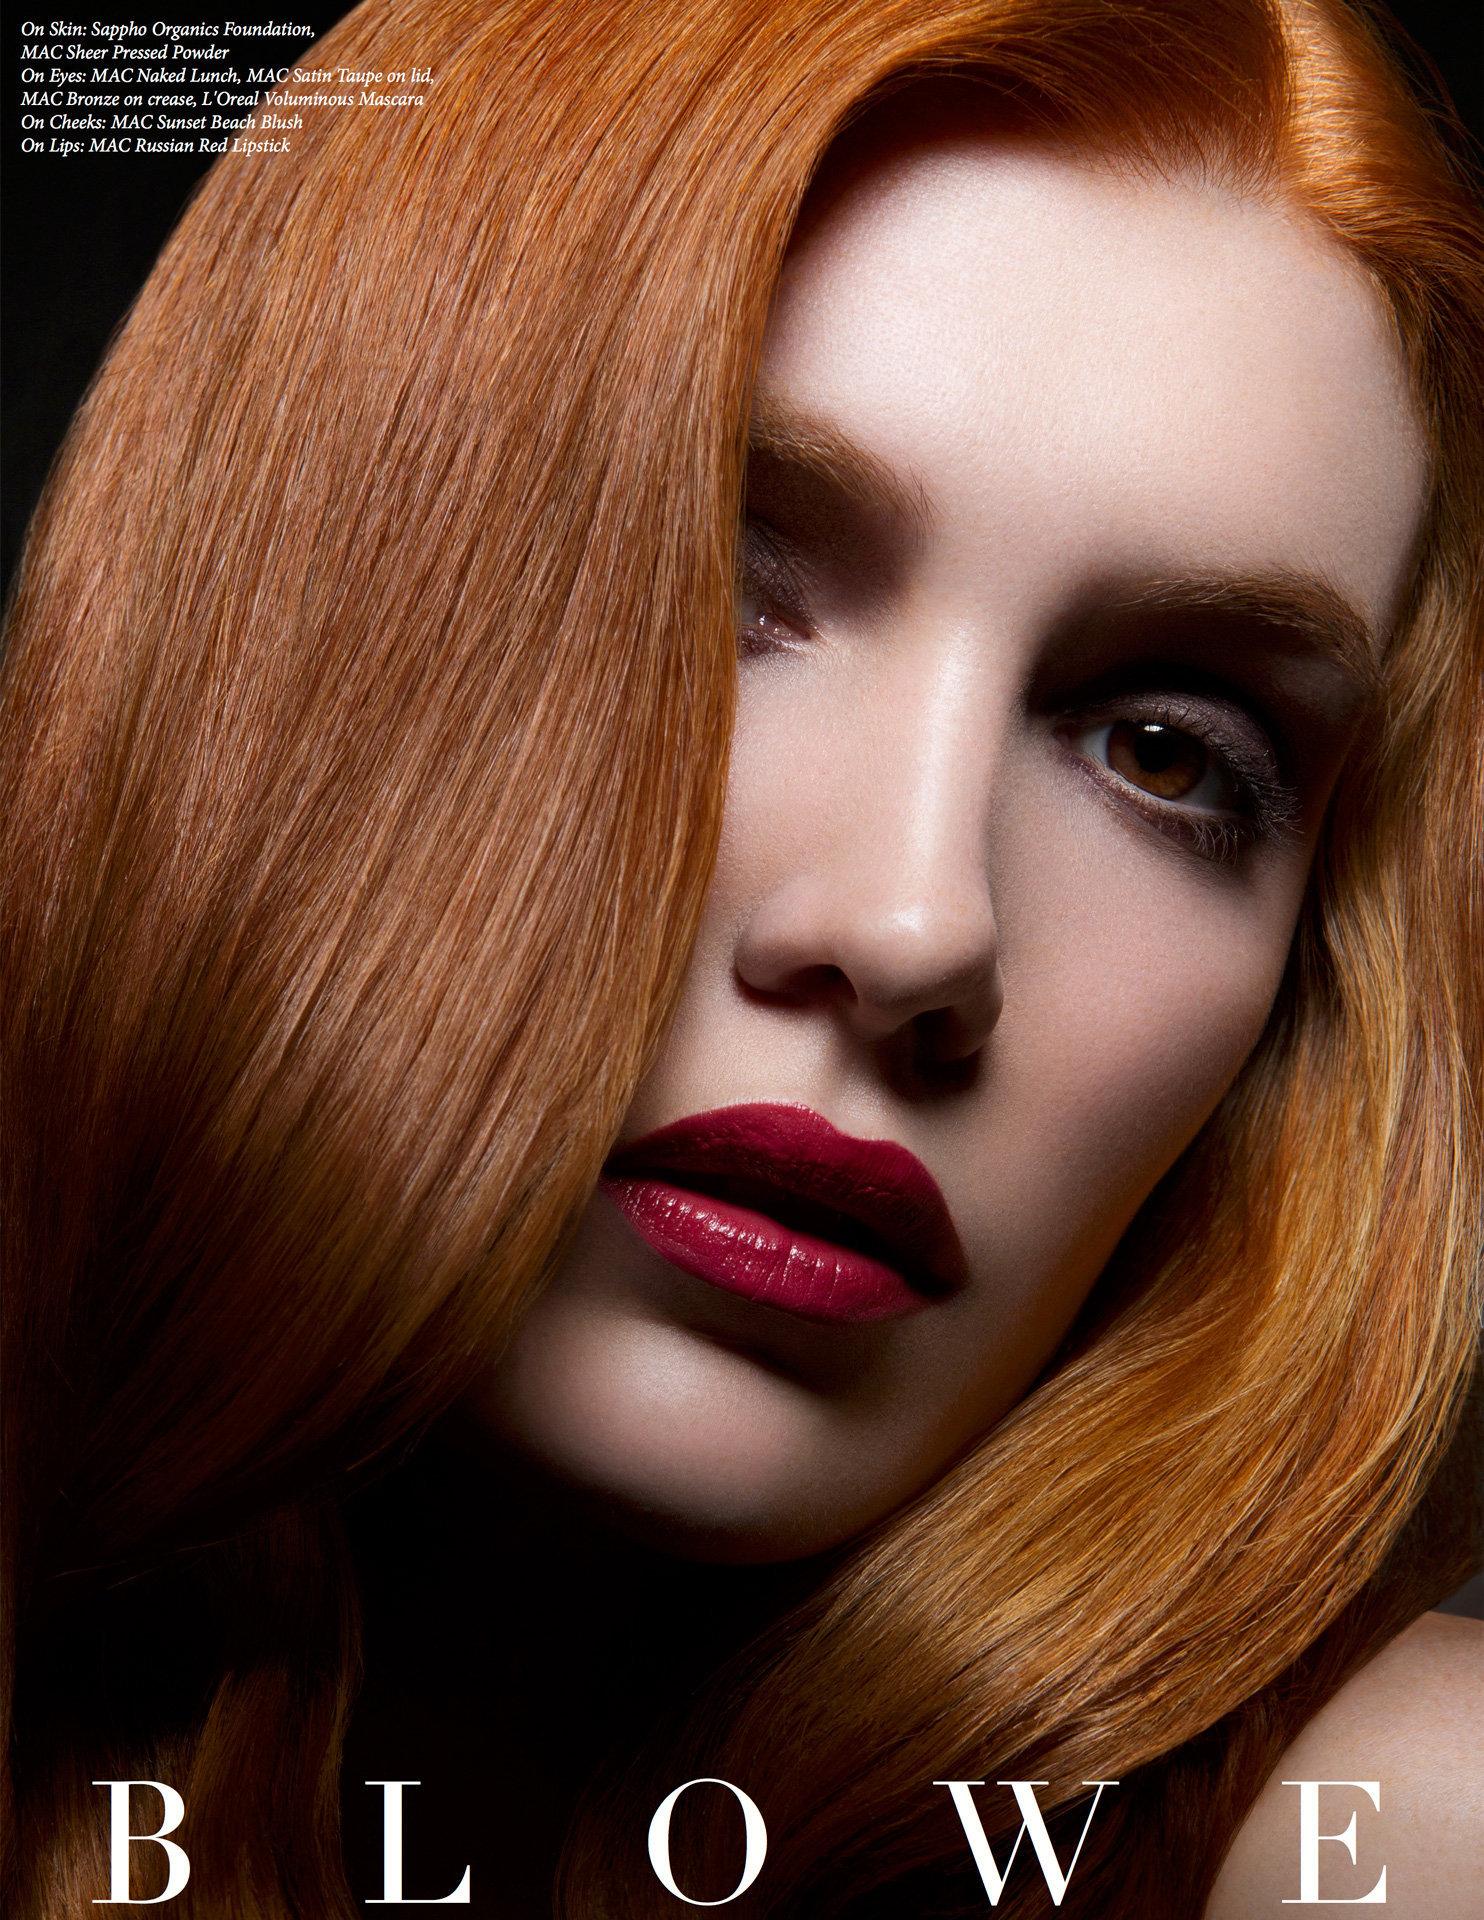 The-Flame-1-Blowe-_04_gabe_toth_dylan_k_hanson_haircreative direction-web.jpg